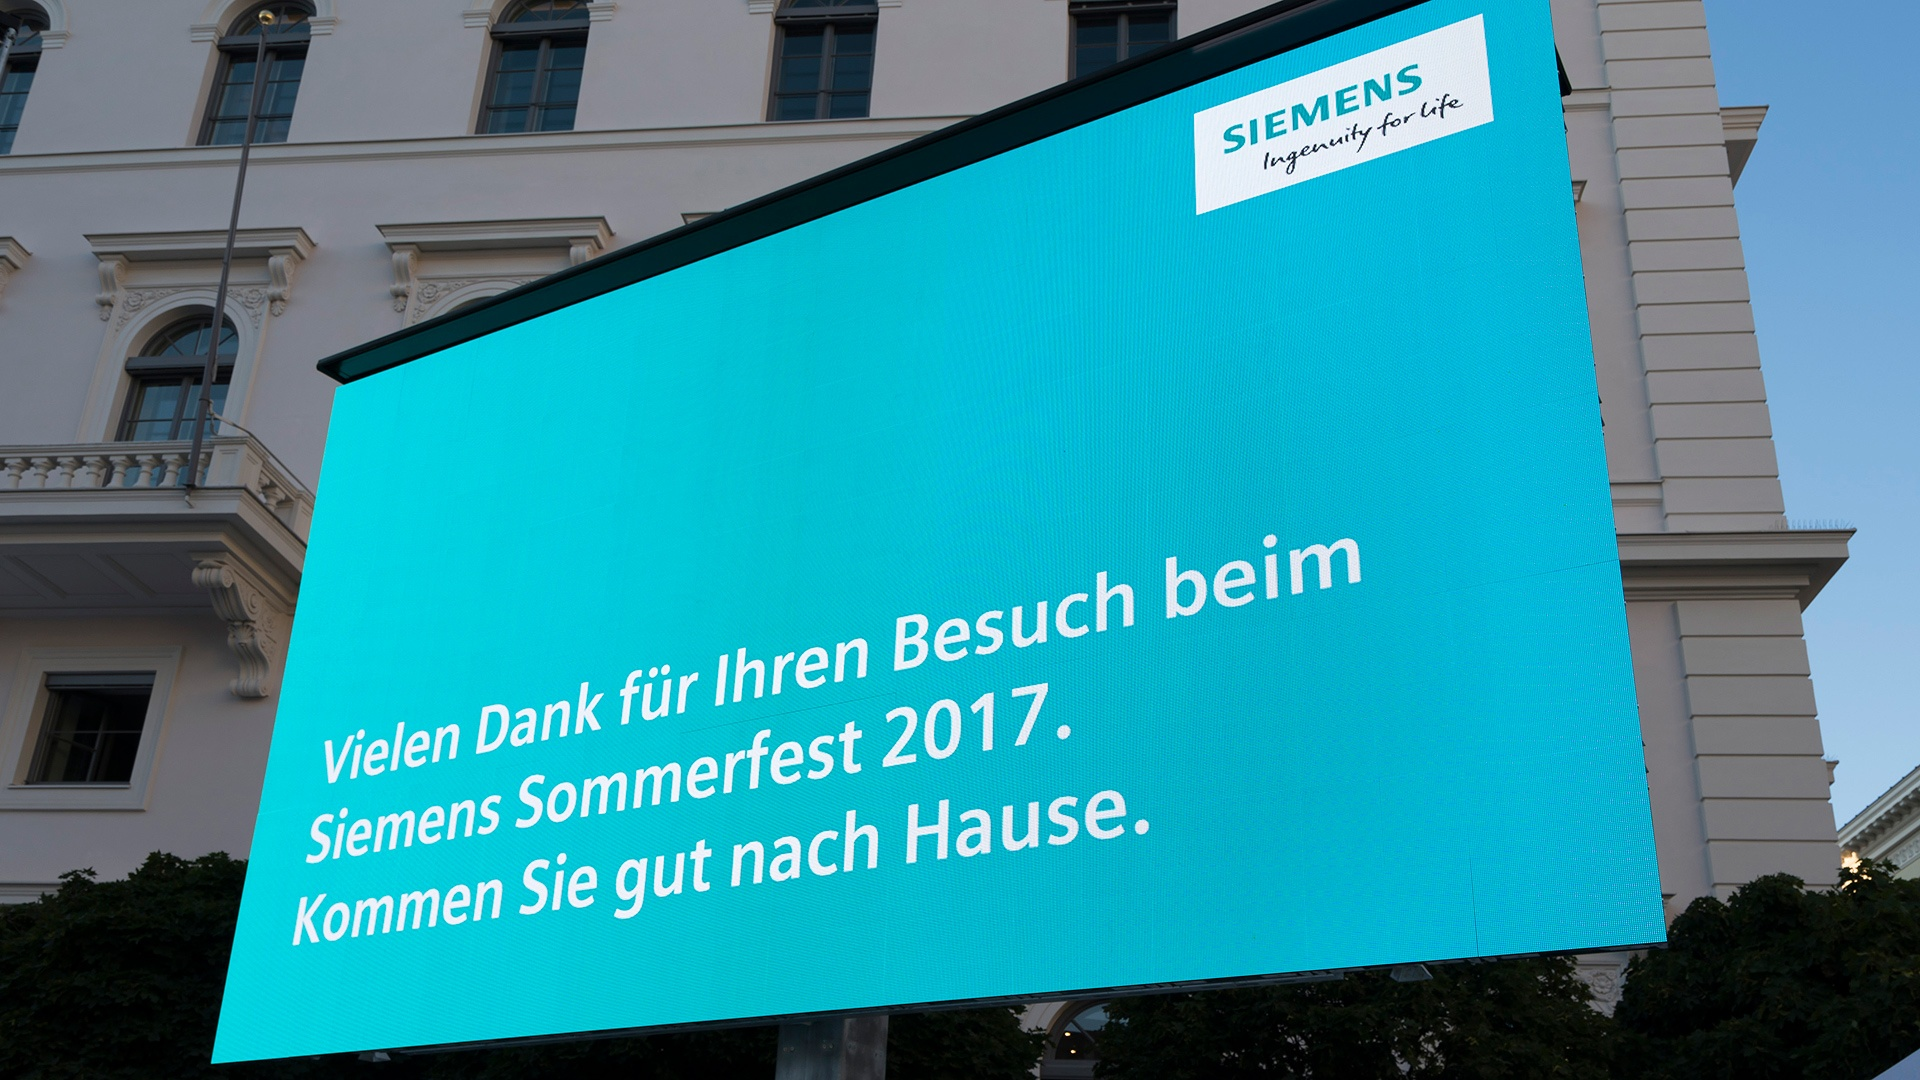 Siemens Sommerfest 2017